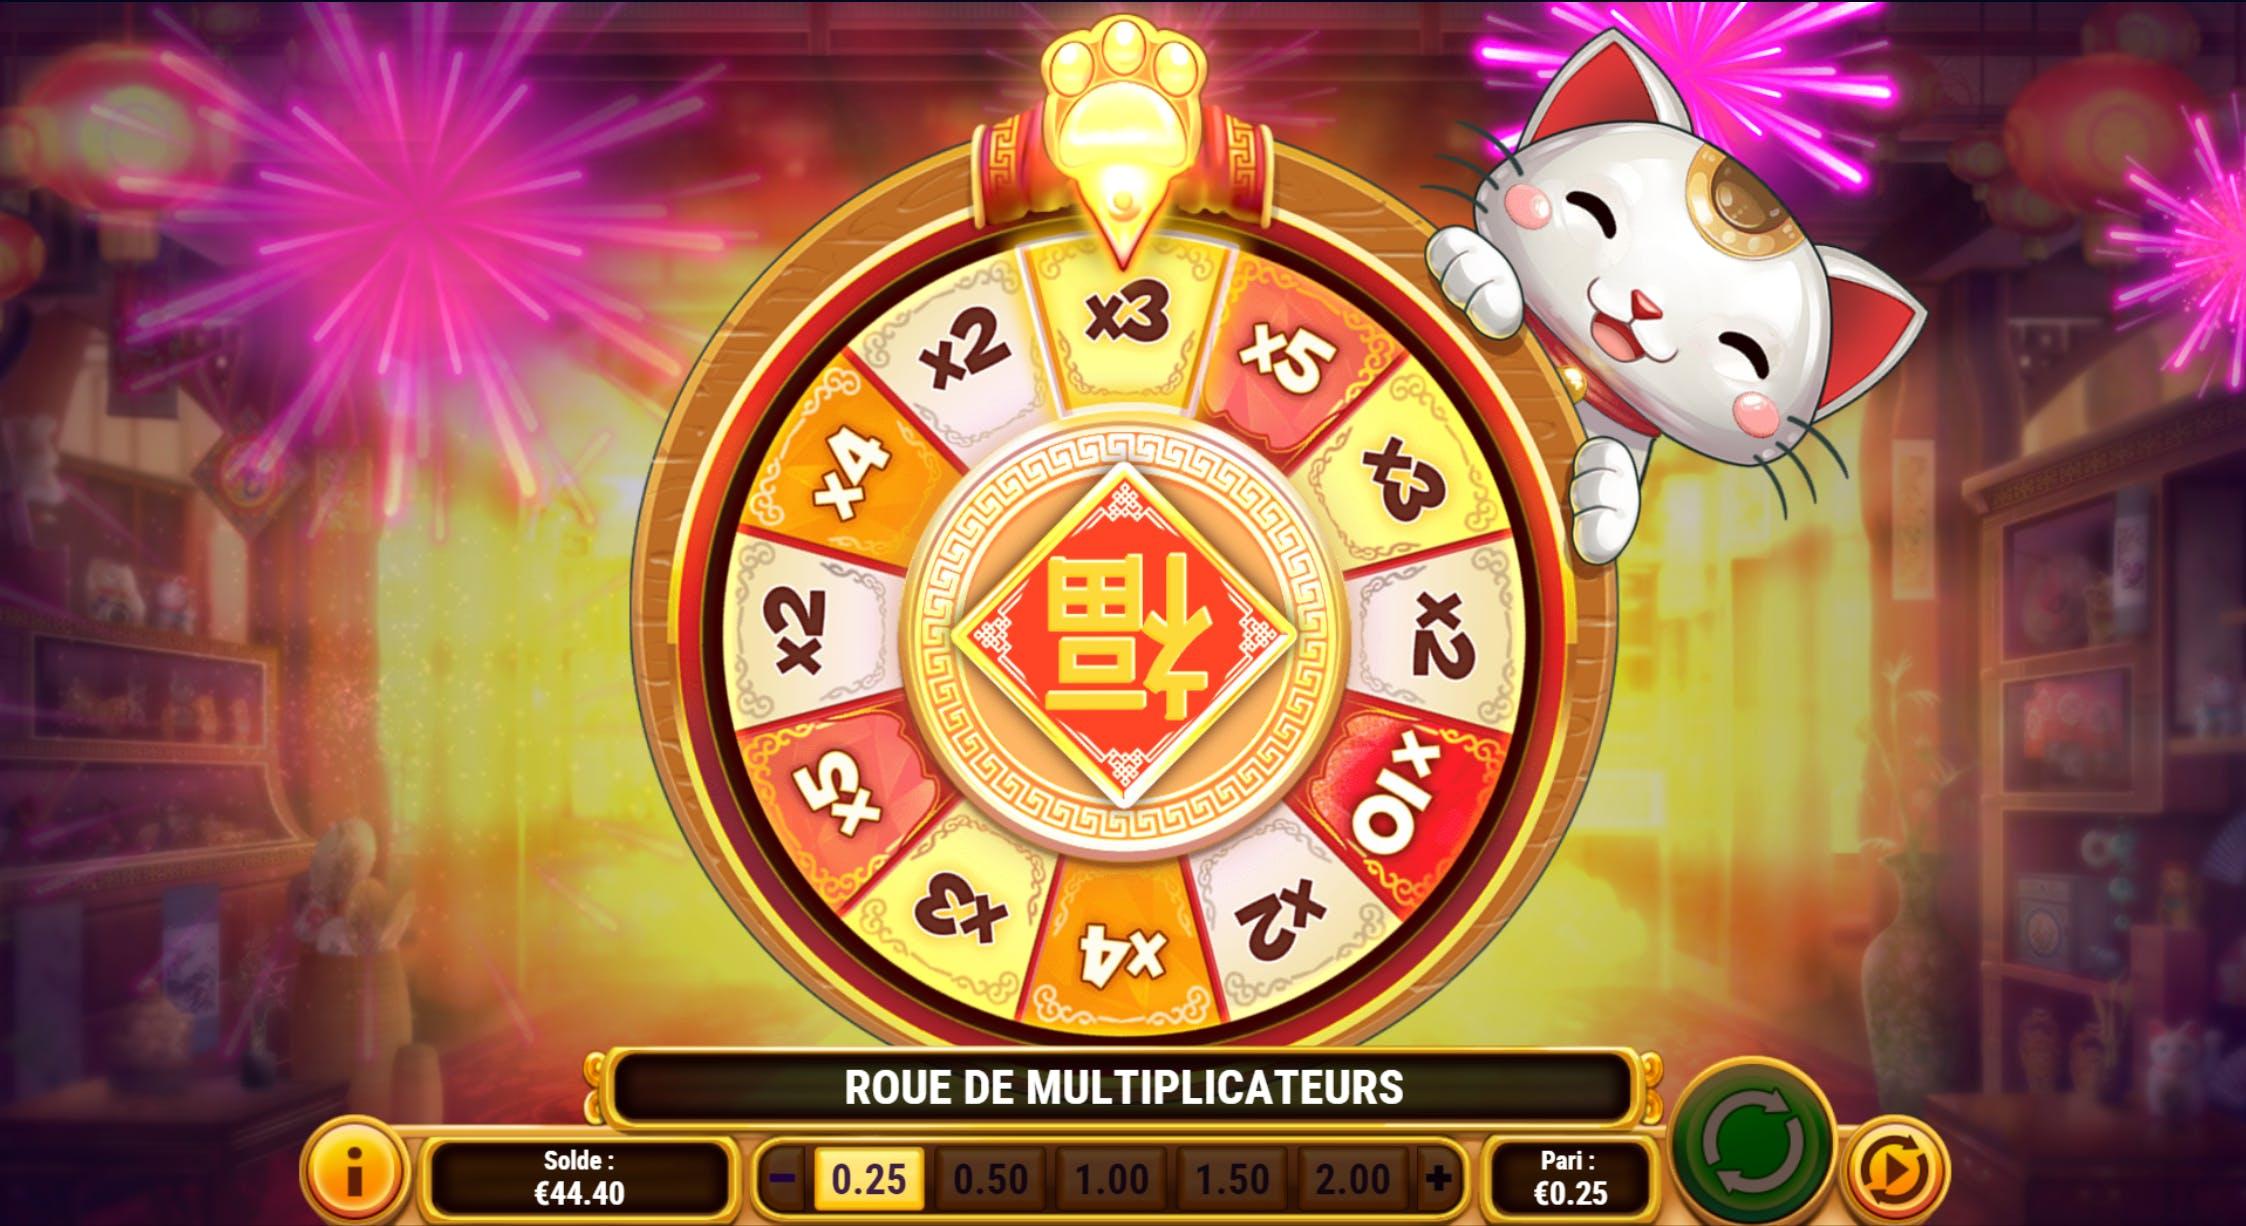 roue de la fortune big win cat playngo